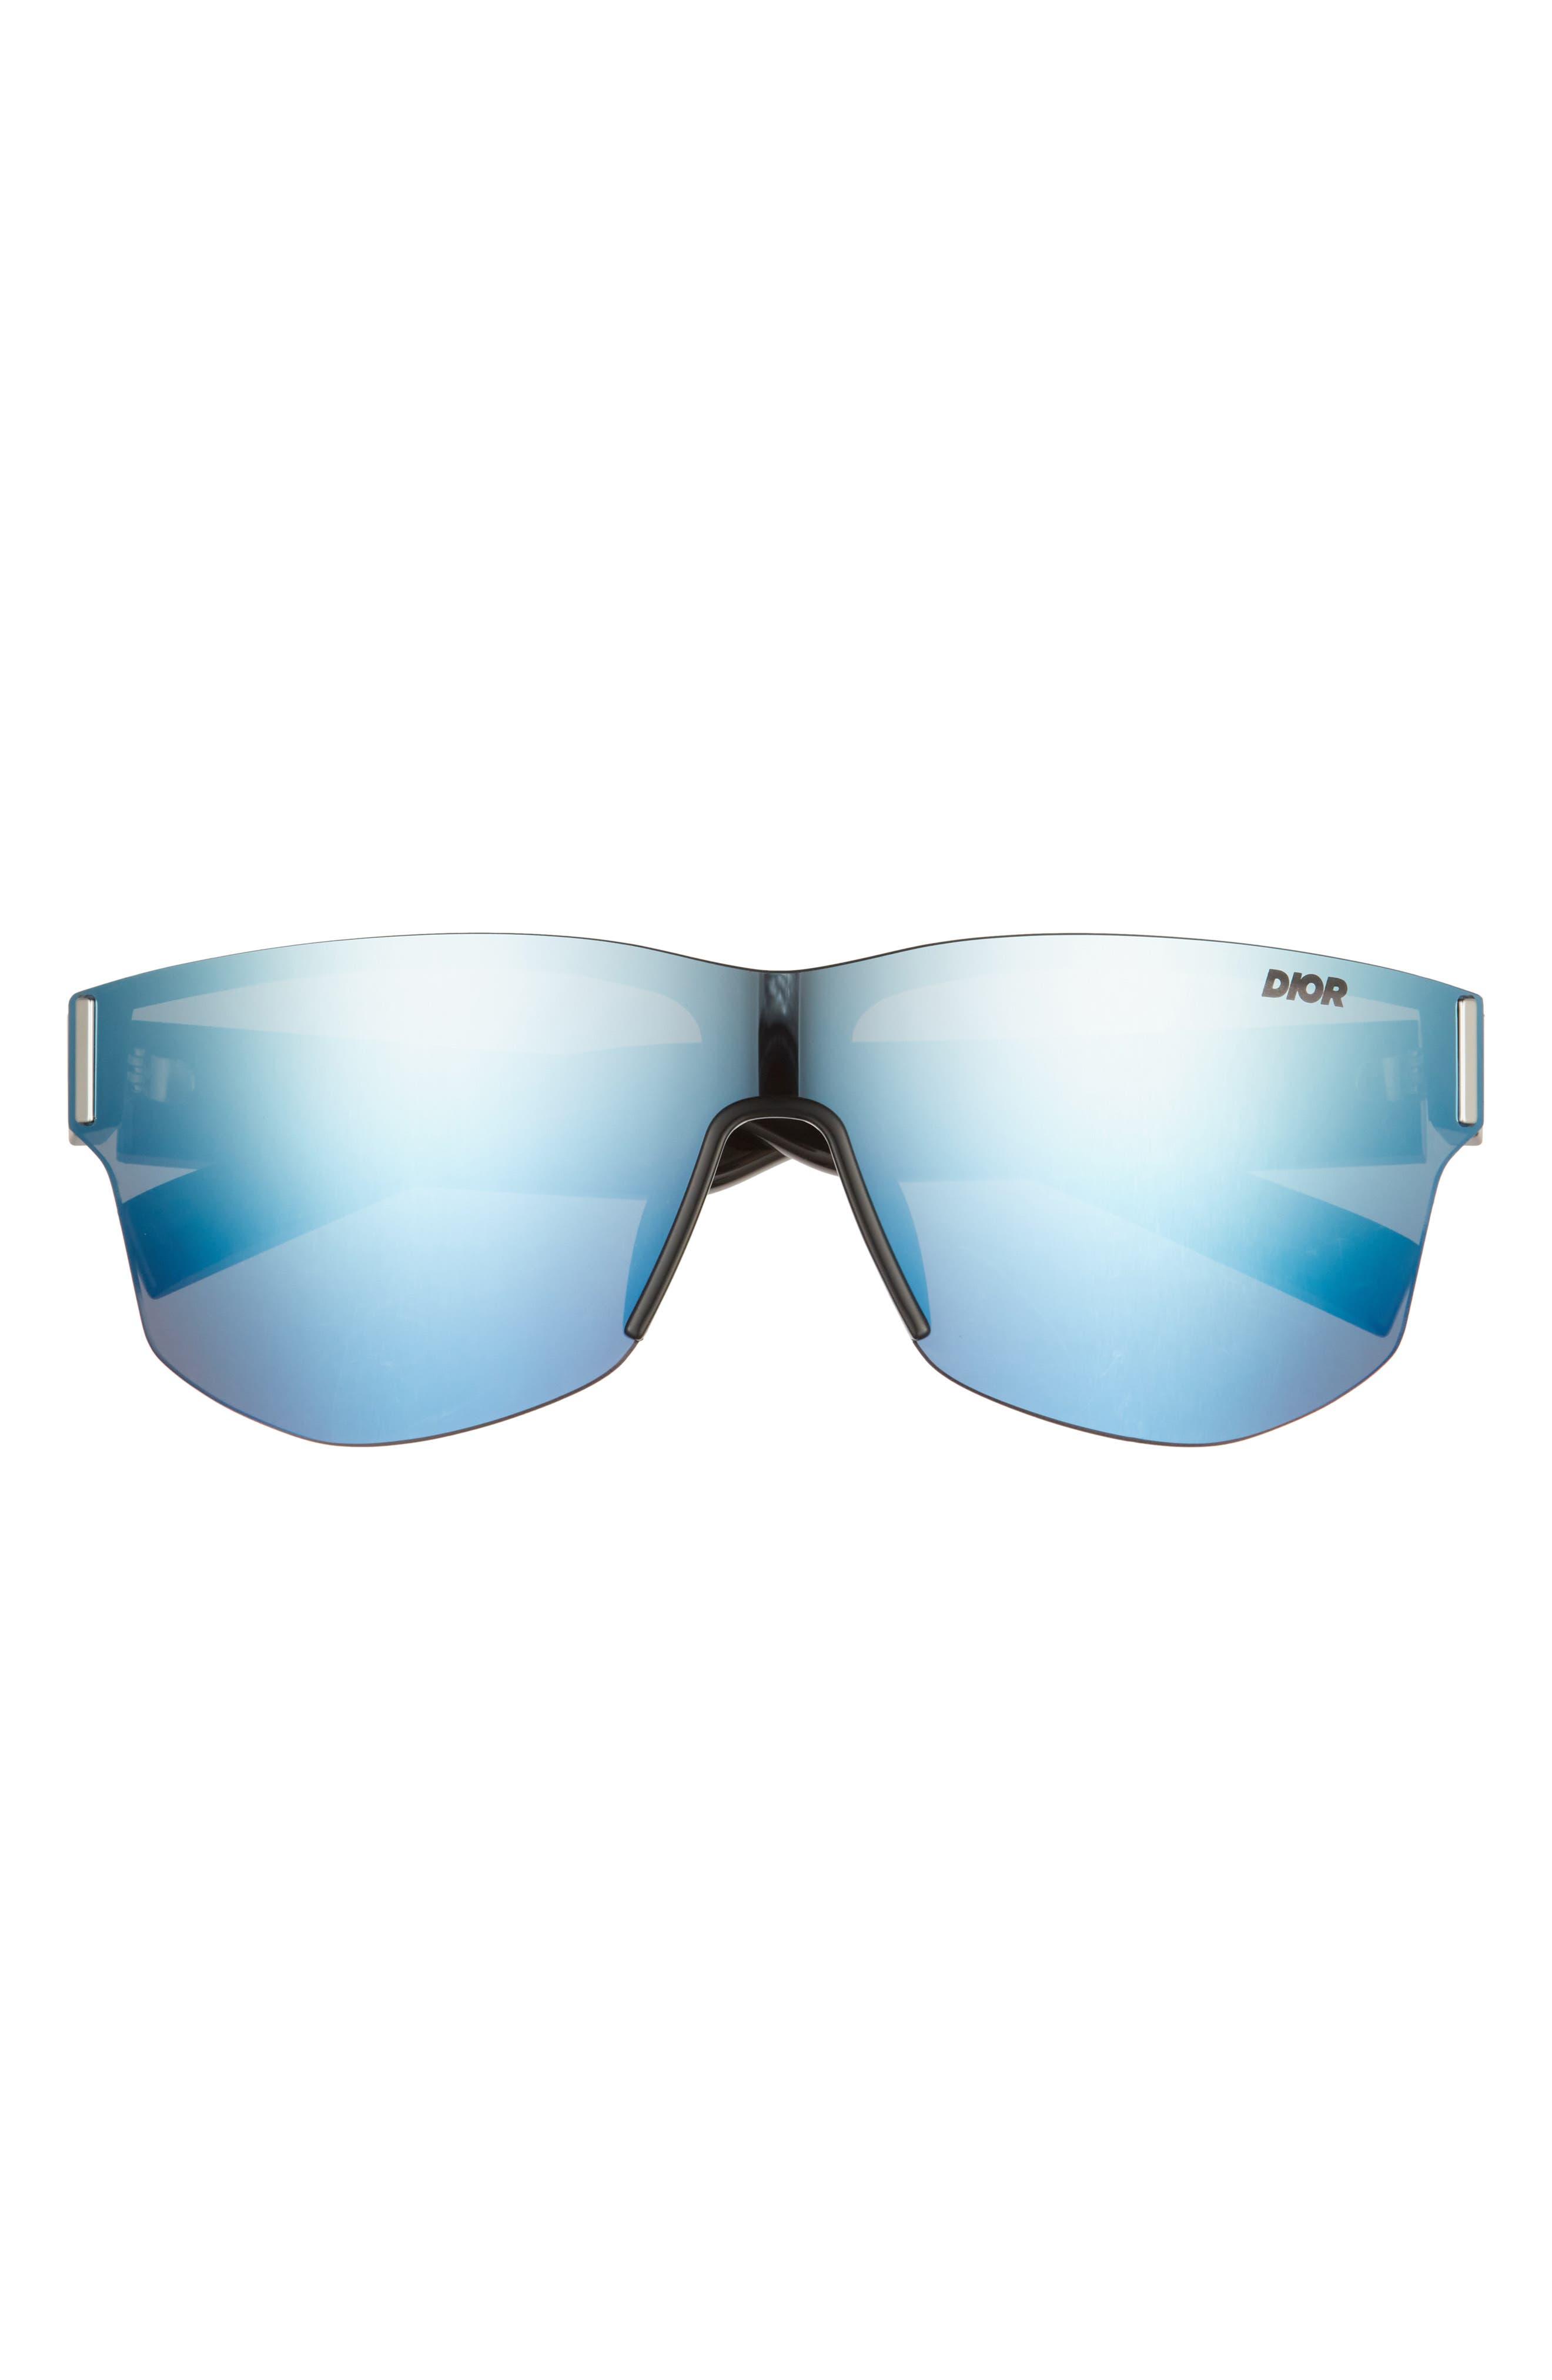 Men's Dior Diorxtrem M2U Mirrored Mask Sunglasses